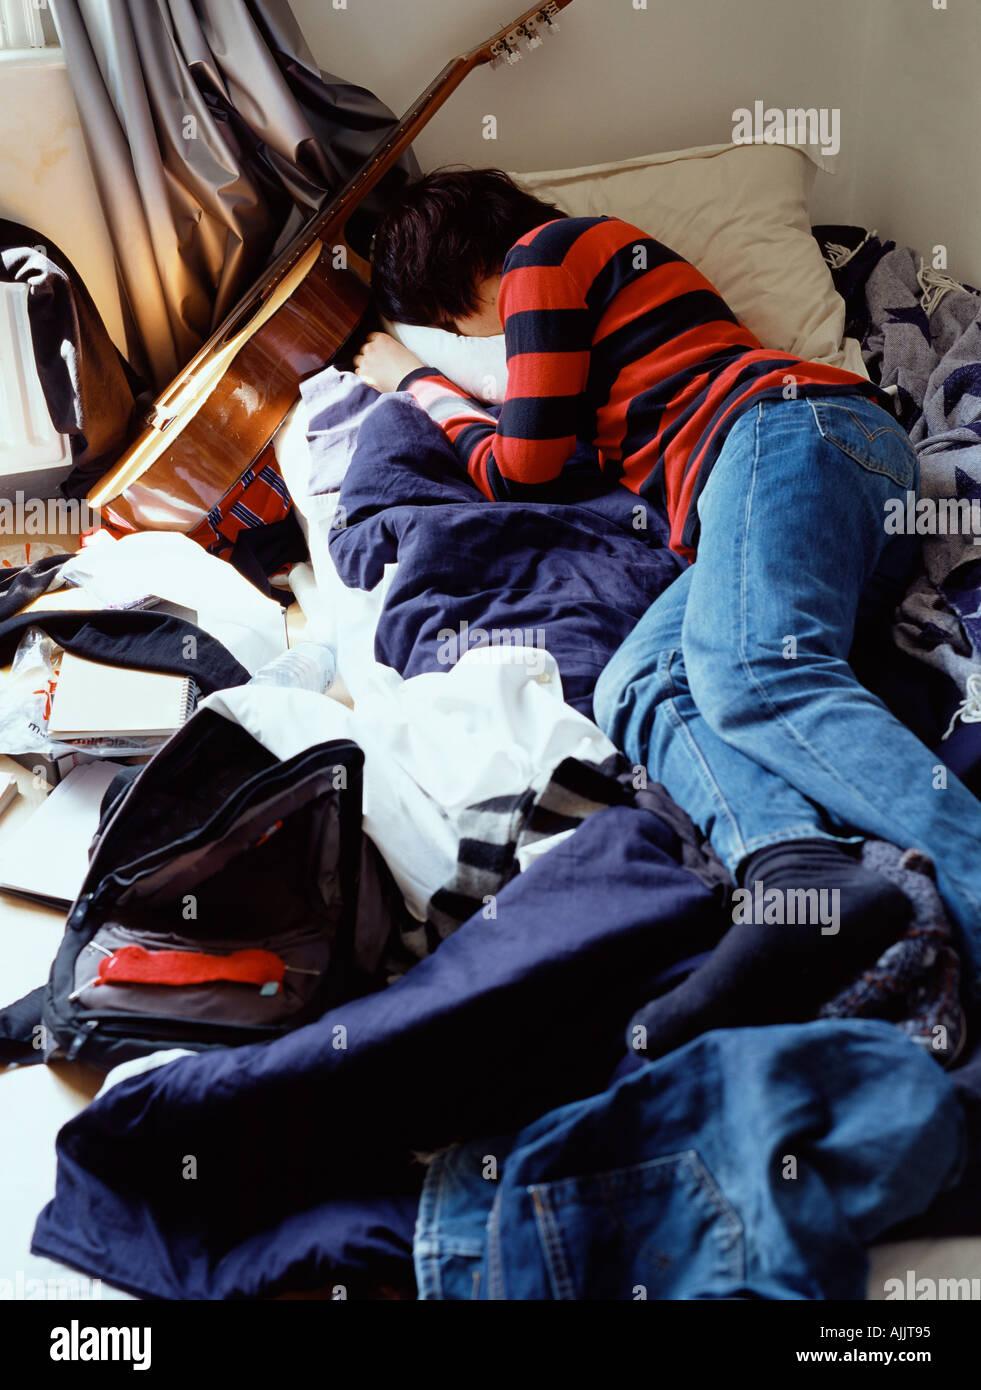 Boy sleeping on messy bed - Stock Image